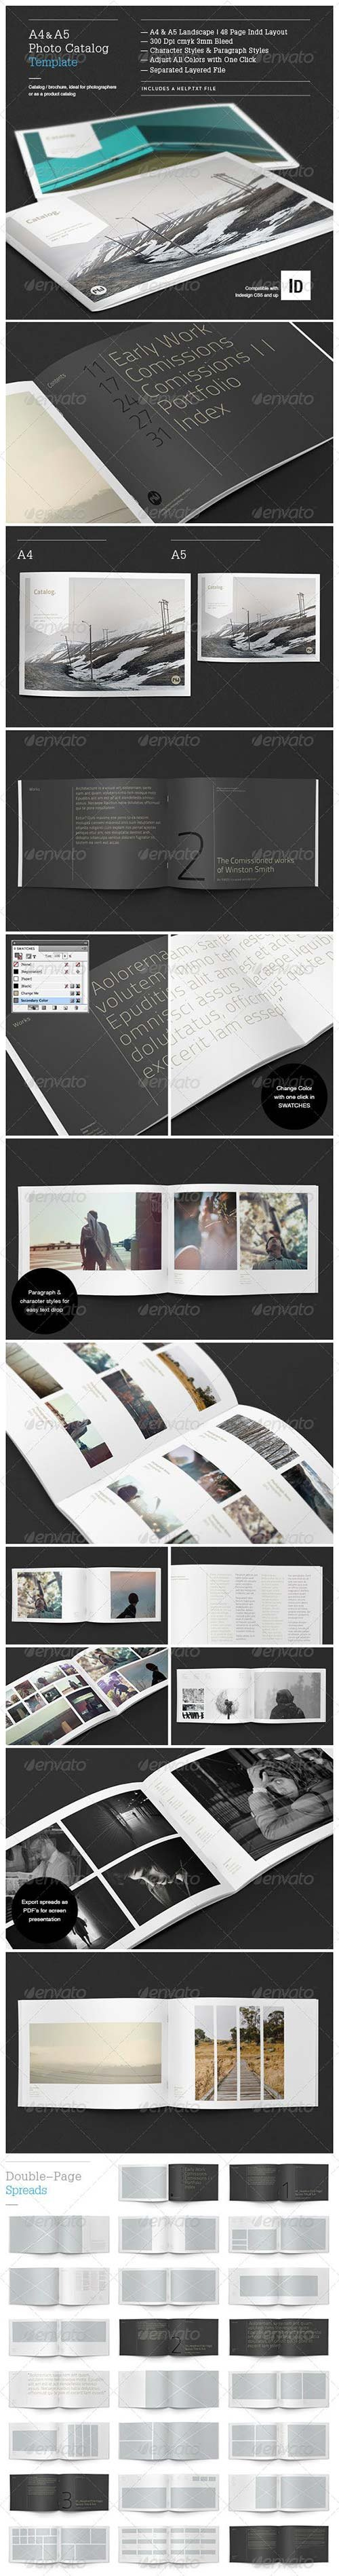 GraphicRiver - Minimal Photo Catalog Template 4143498